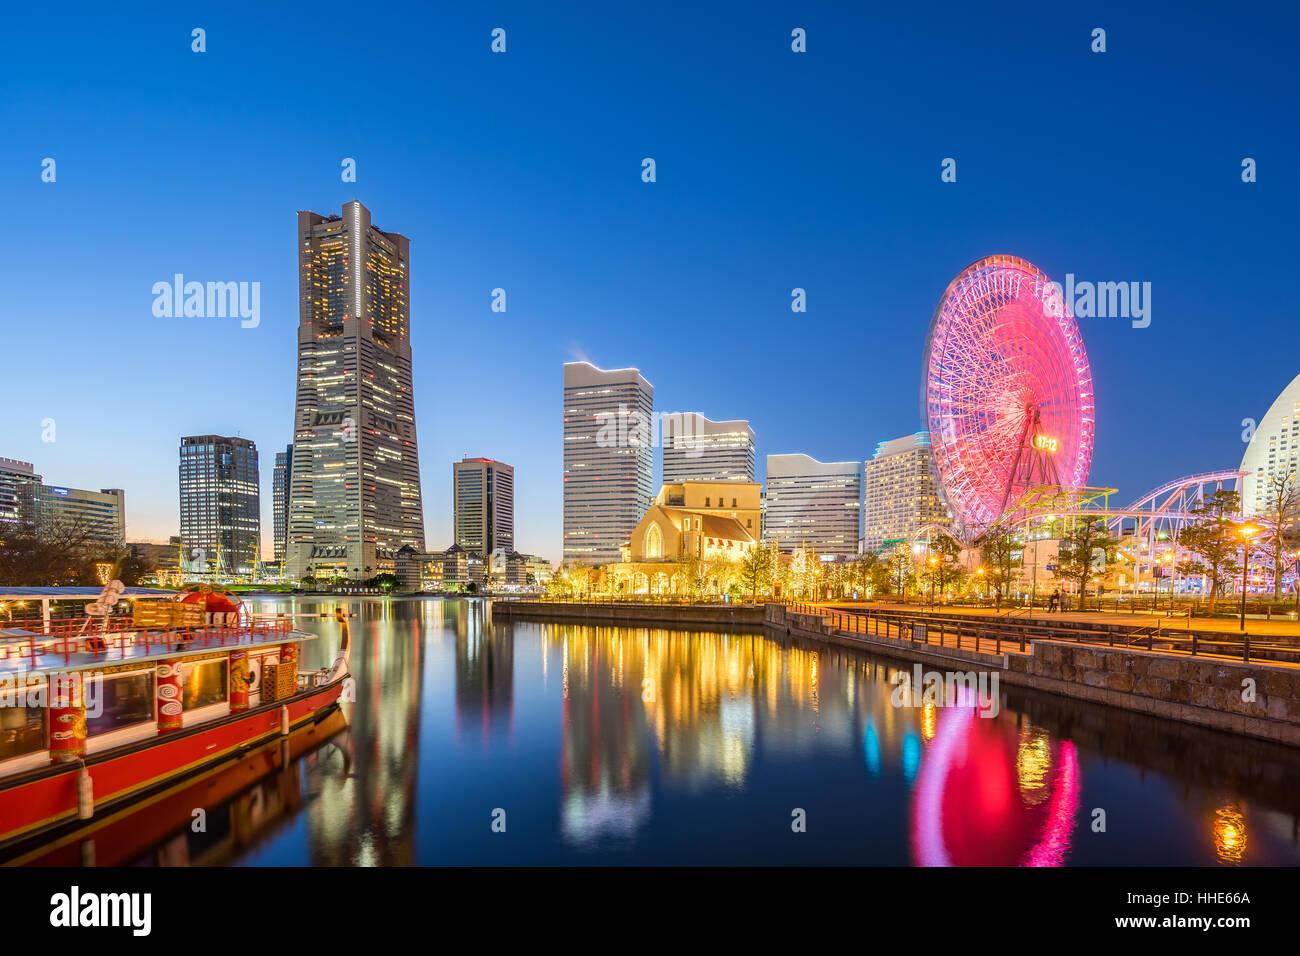 Night view of Yokohama skyline in Minato Mirai, Yokohama, Japan. - Stock Image